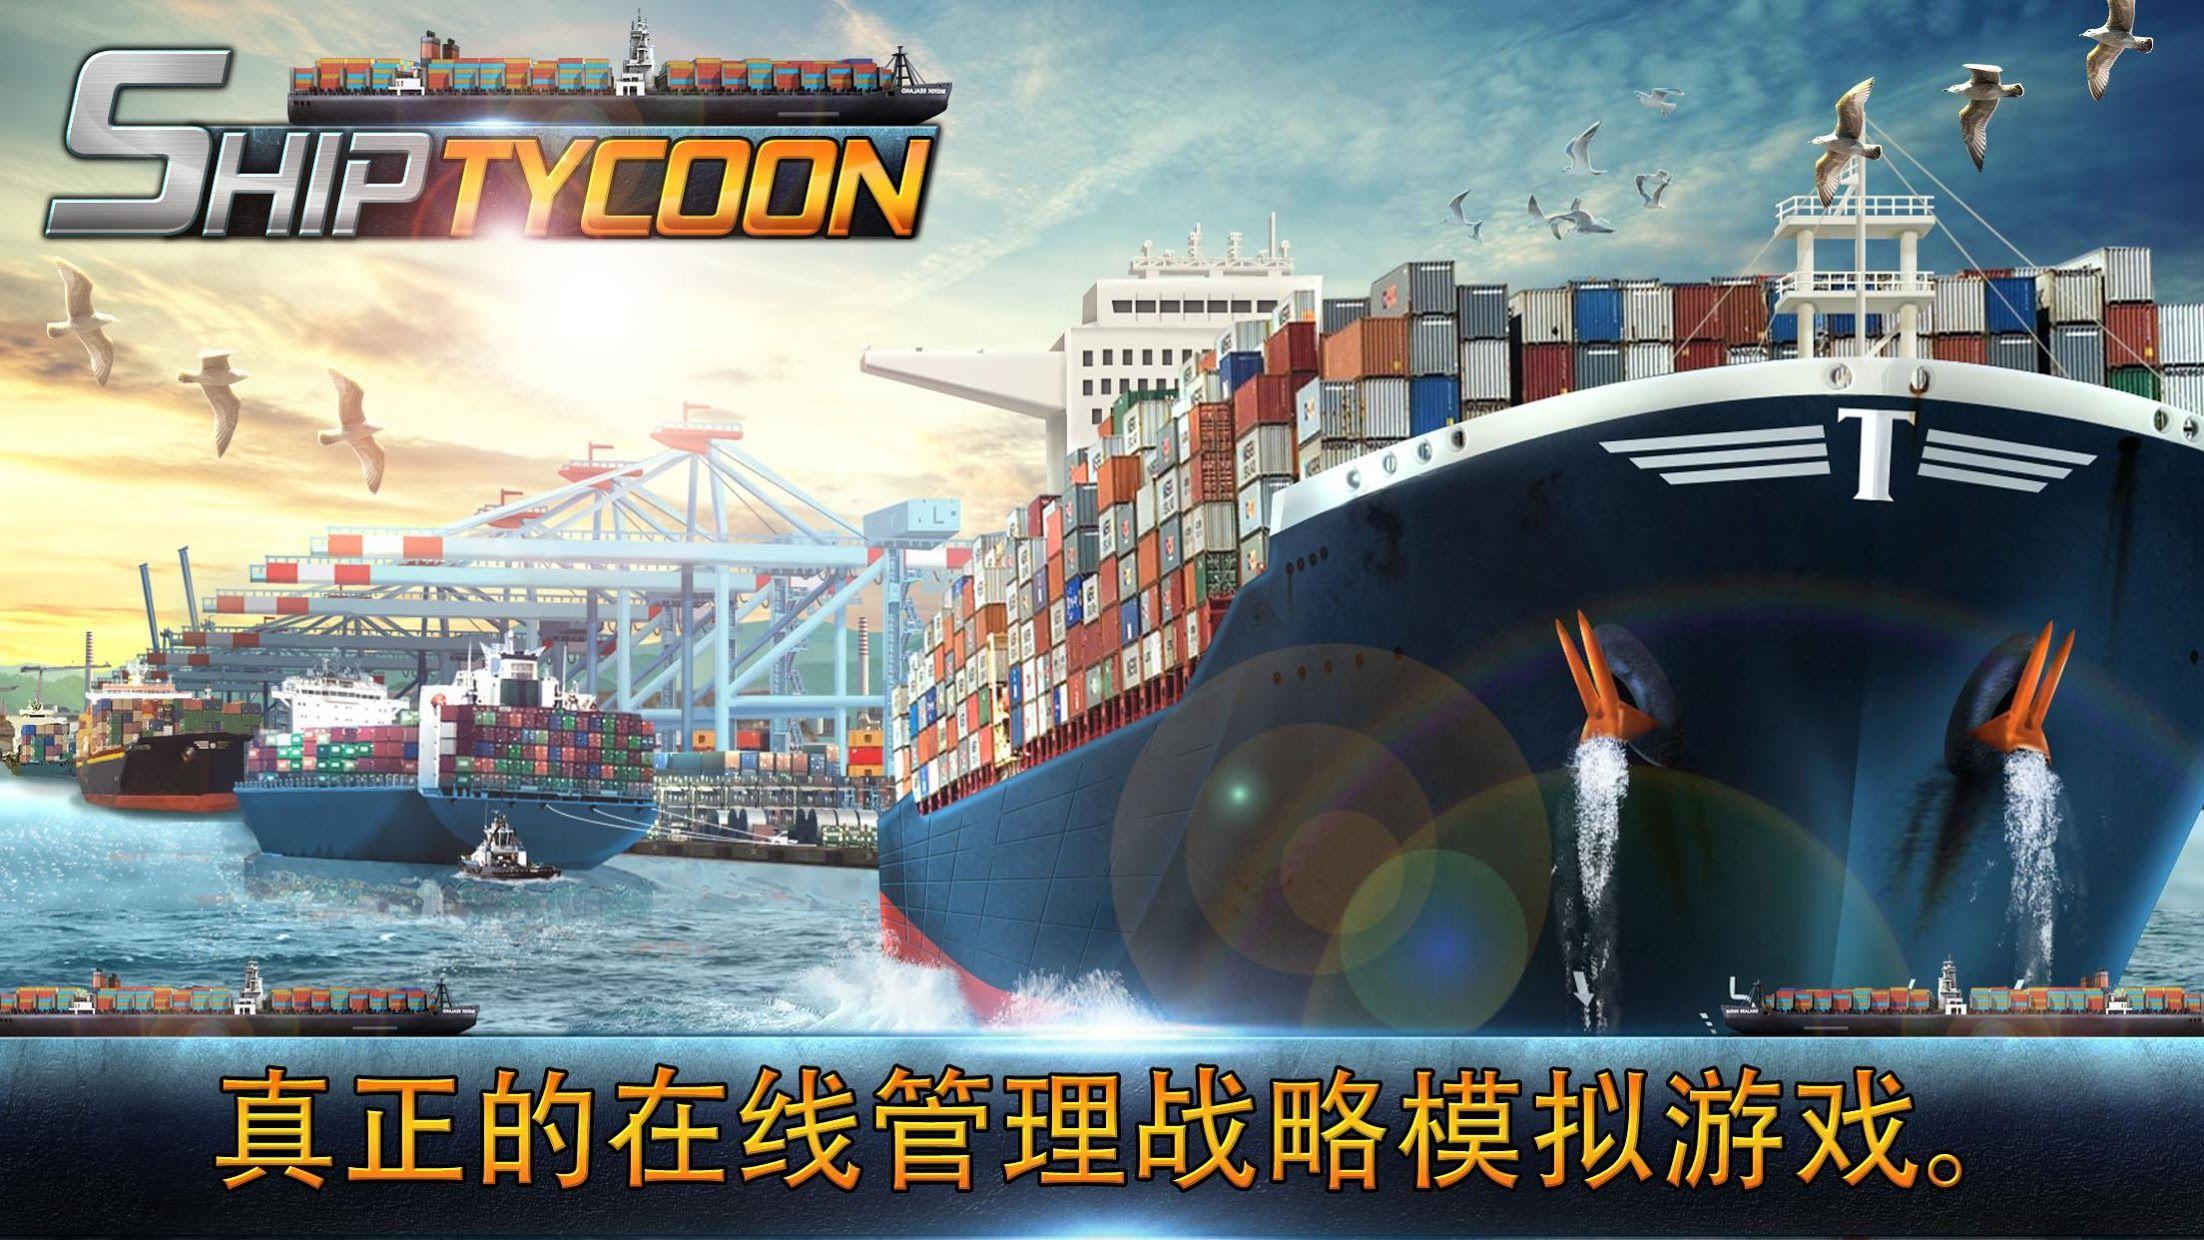 Ship Tycoon 游戏截图1